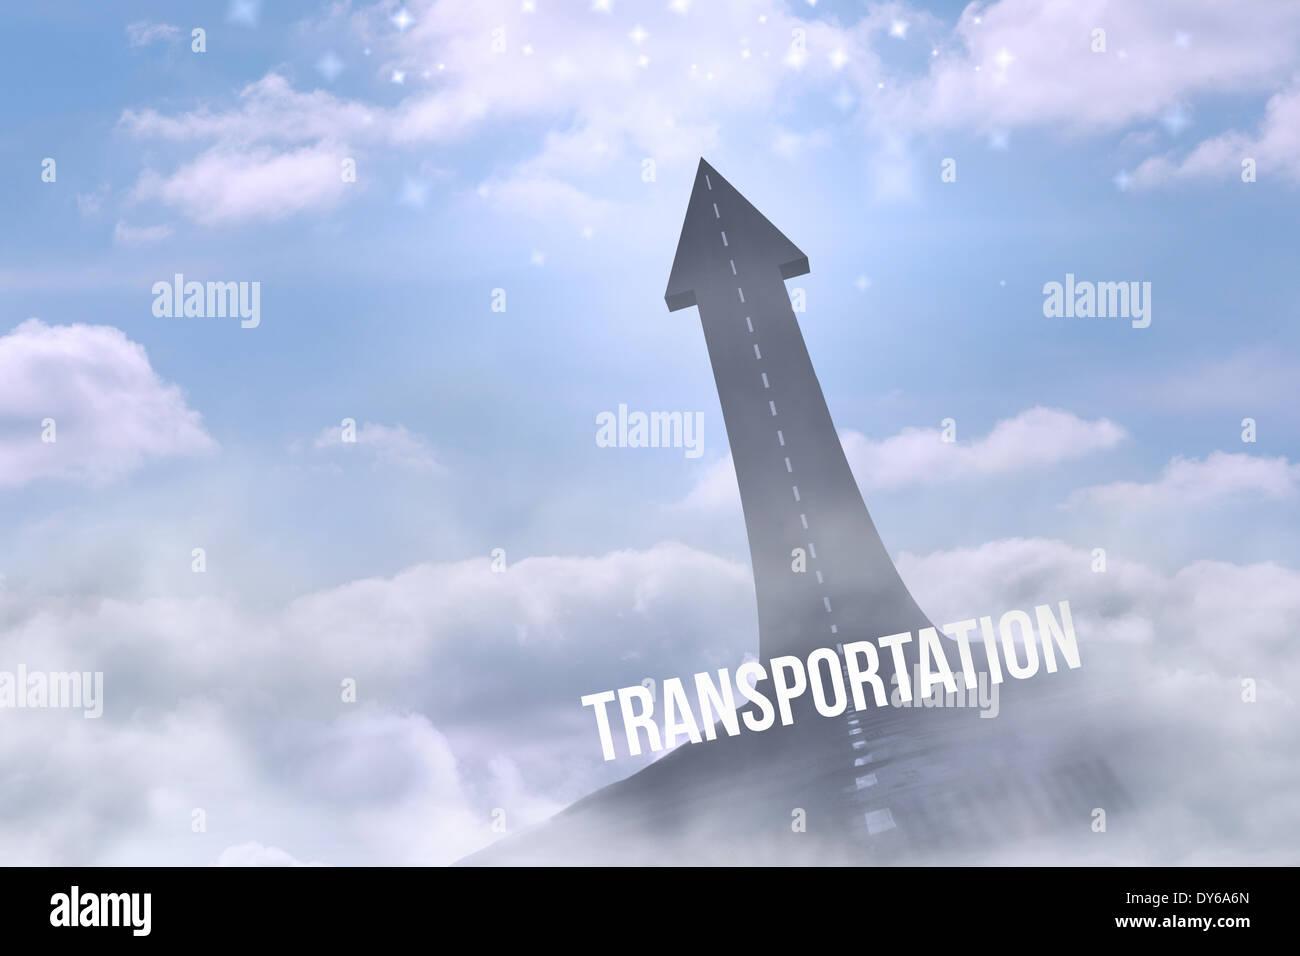 Transporte contra la carretera girando en la flecha Imagen De Stock